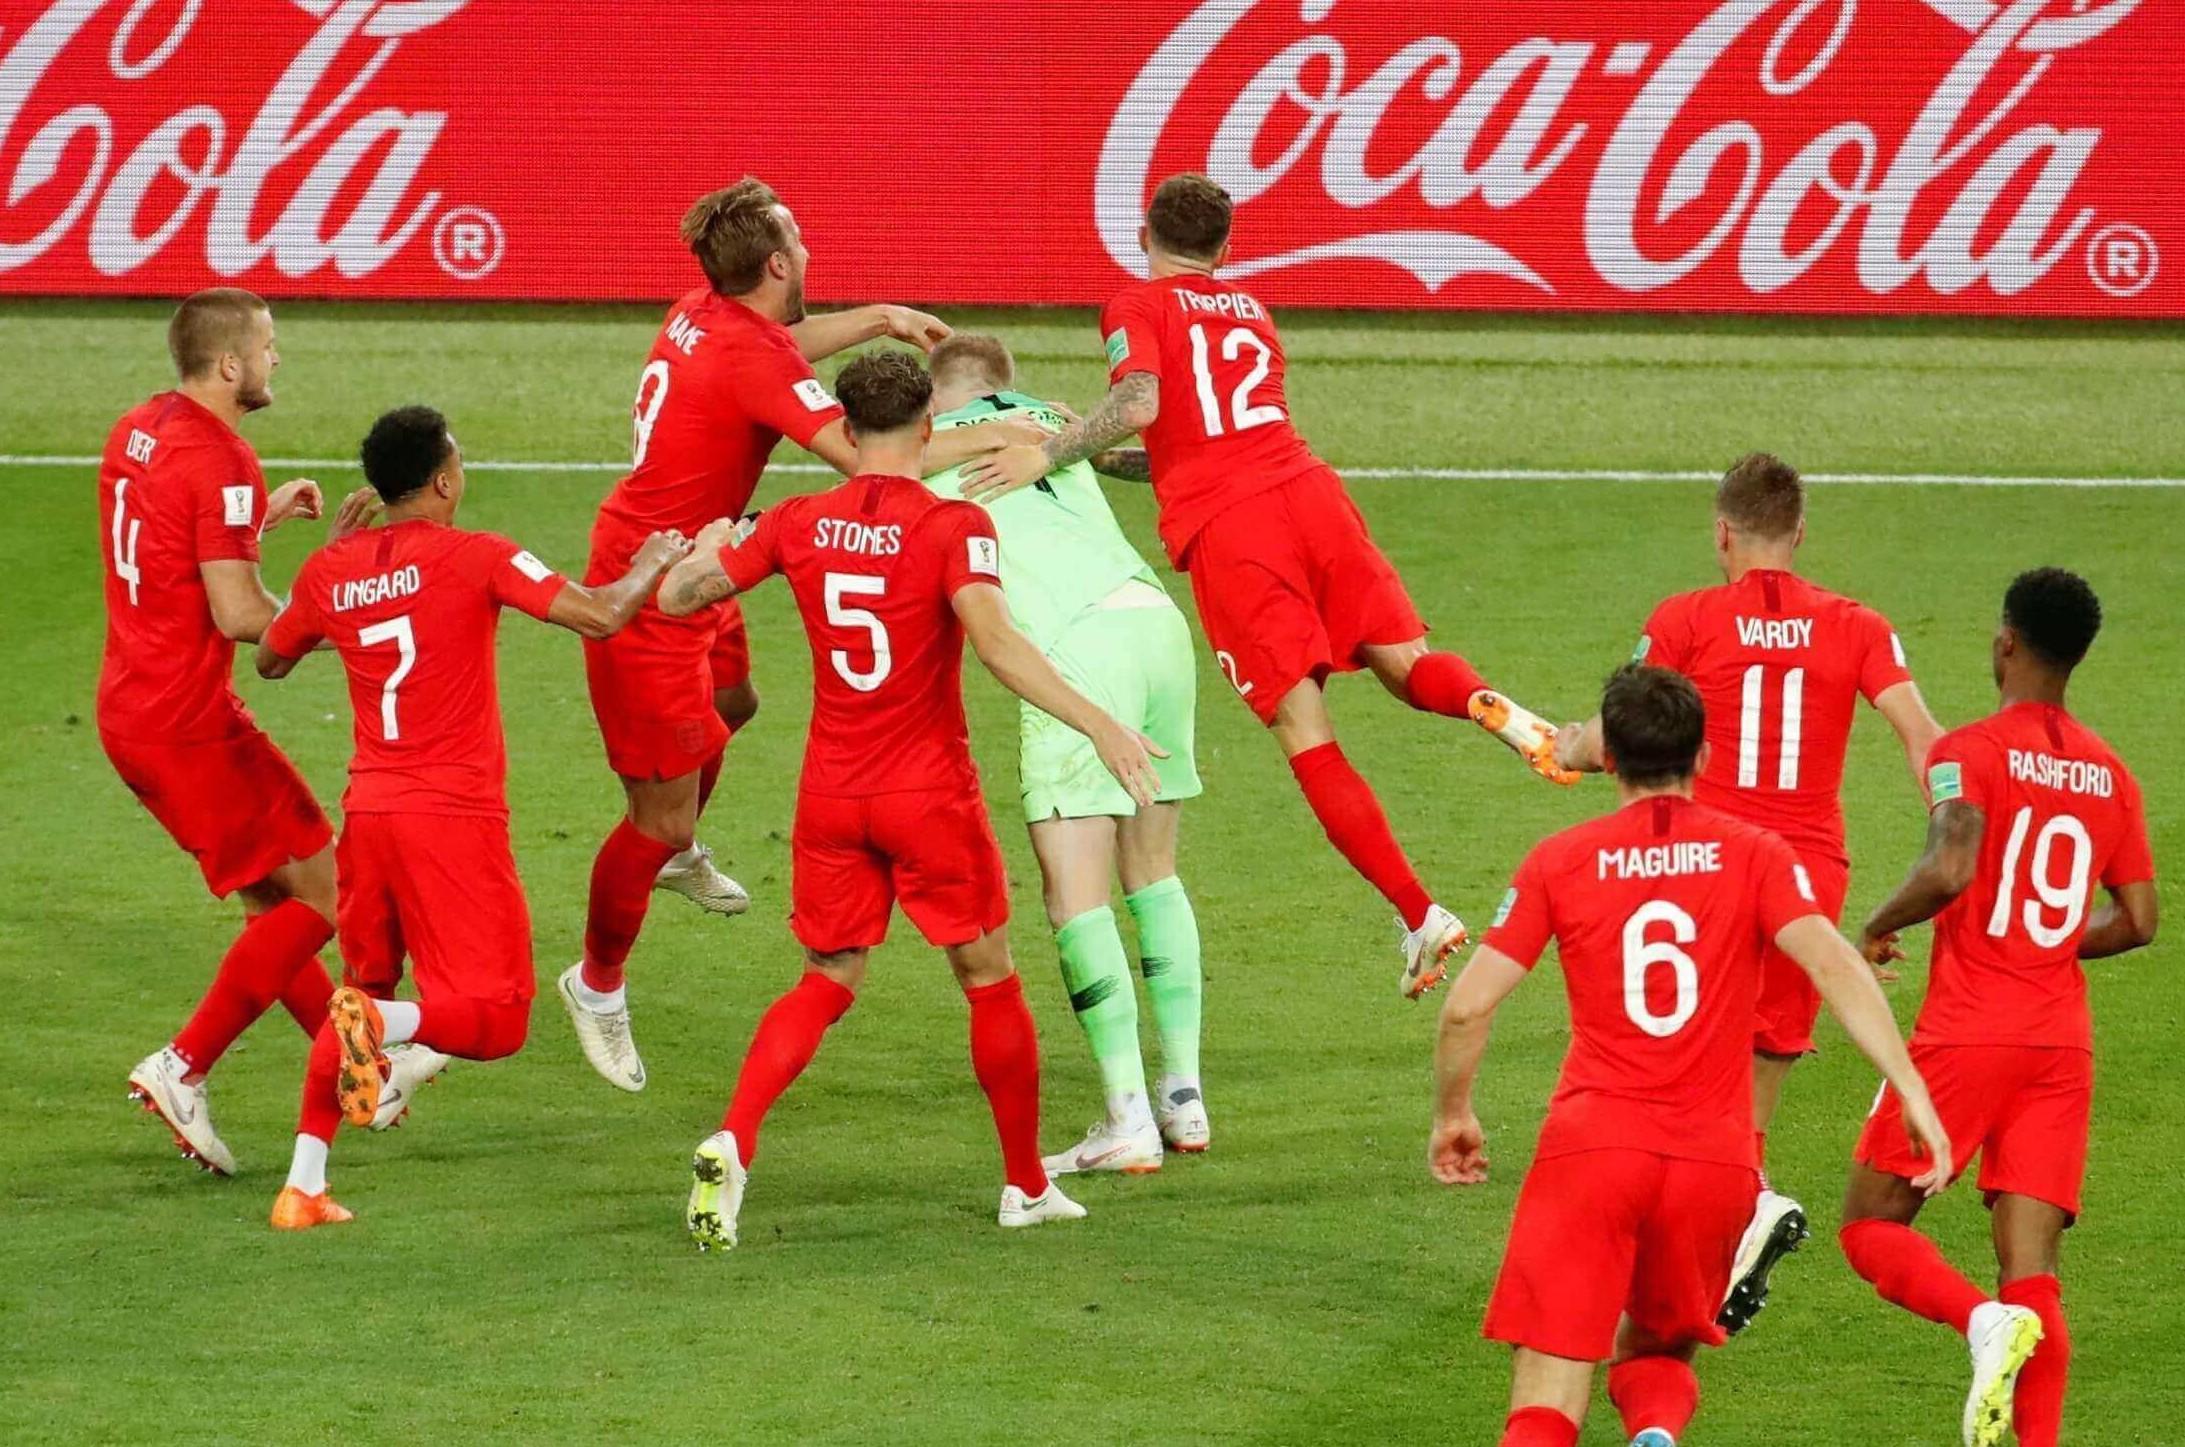 Round of 16: इंगलैंडा पेनालथिआव कोलंबियाखौ 4-3 आ फेजेनो